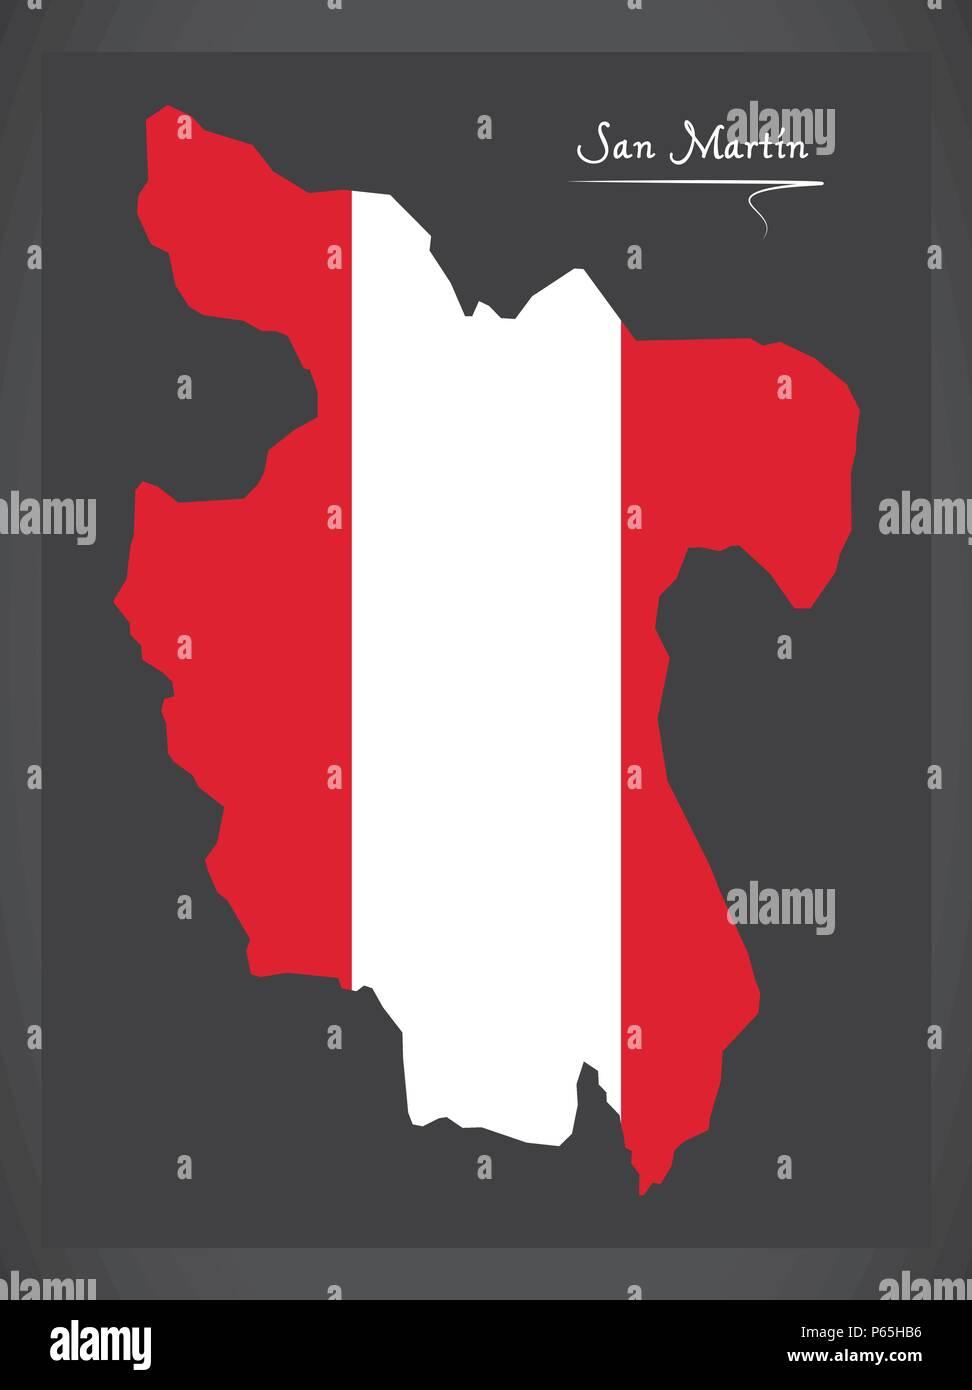 San Martin map with Peruvian national flag illustration - Stock Vector